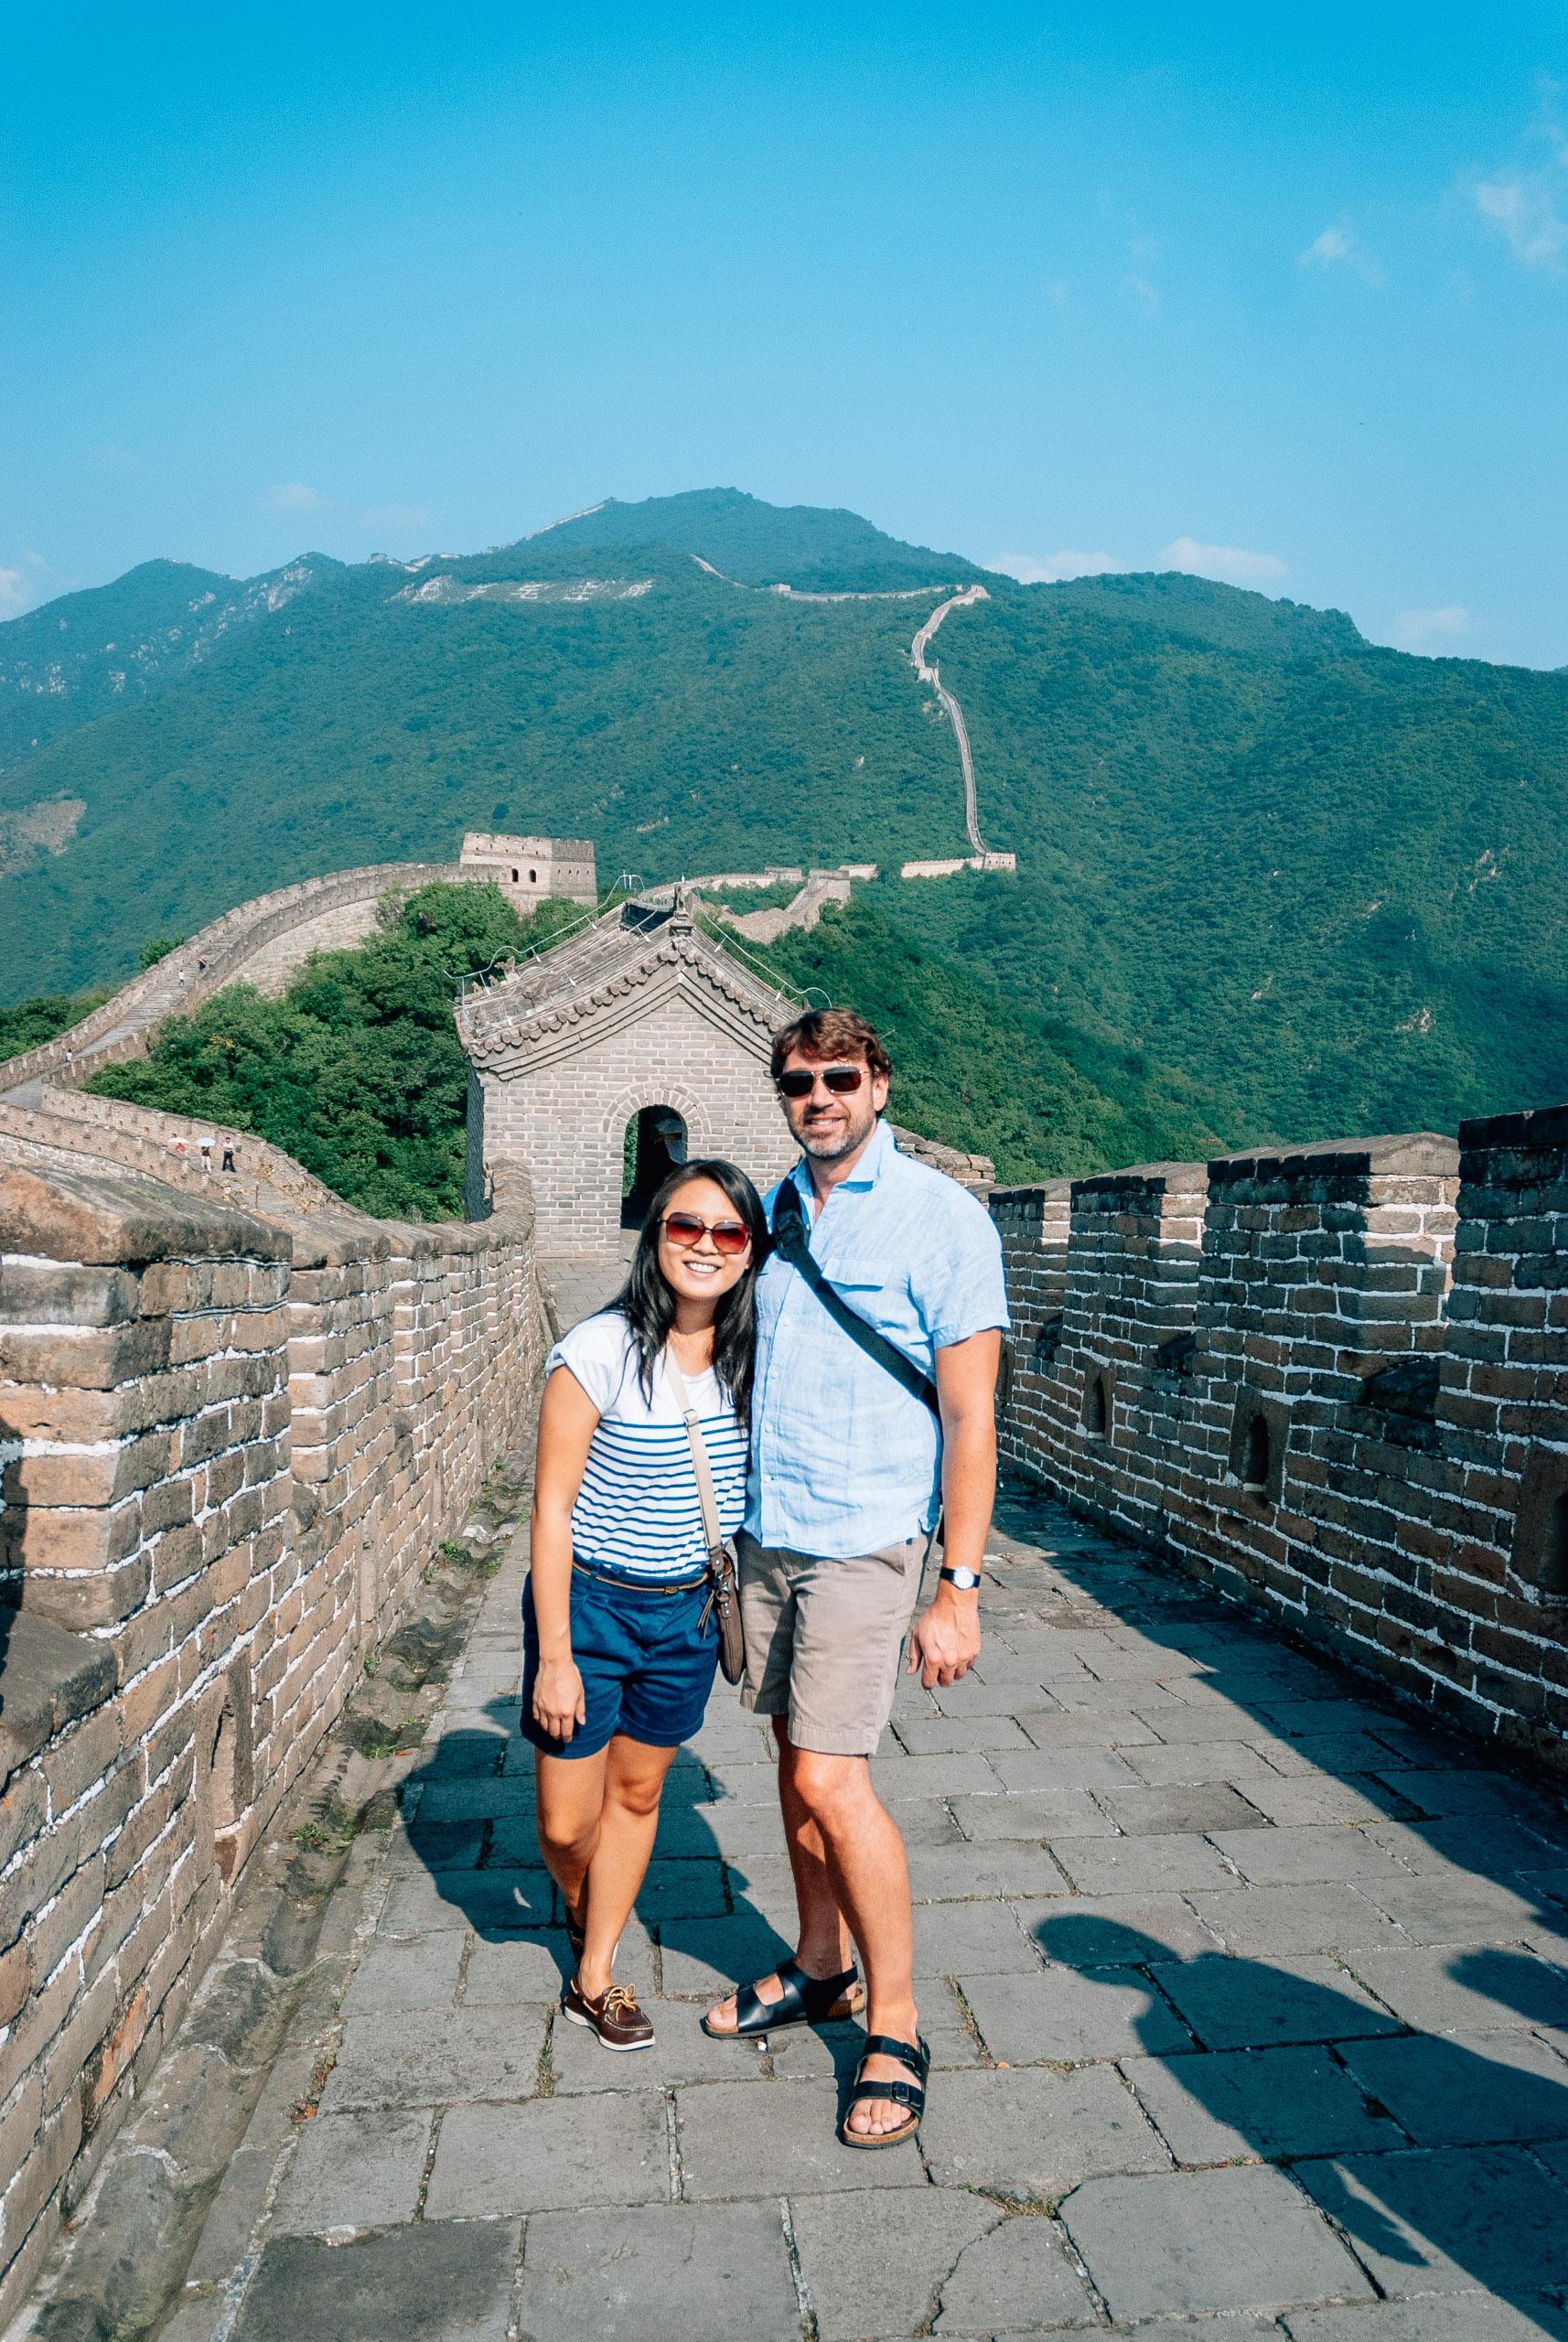 China - Beijing & The Great Wall - 2010-0902-DSC_0131_50915